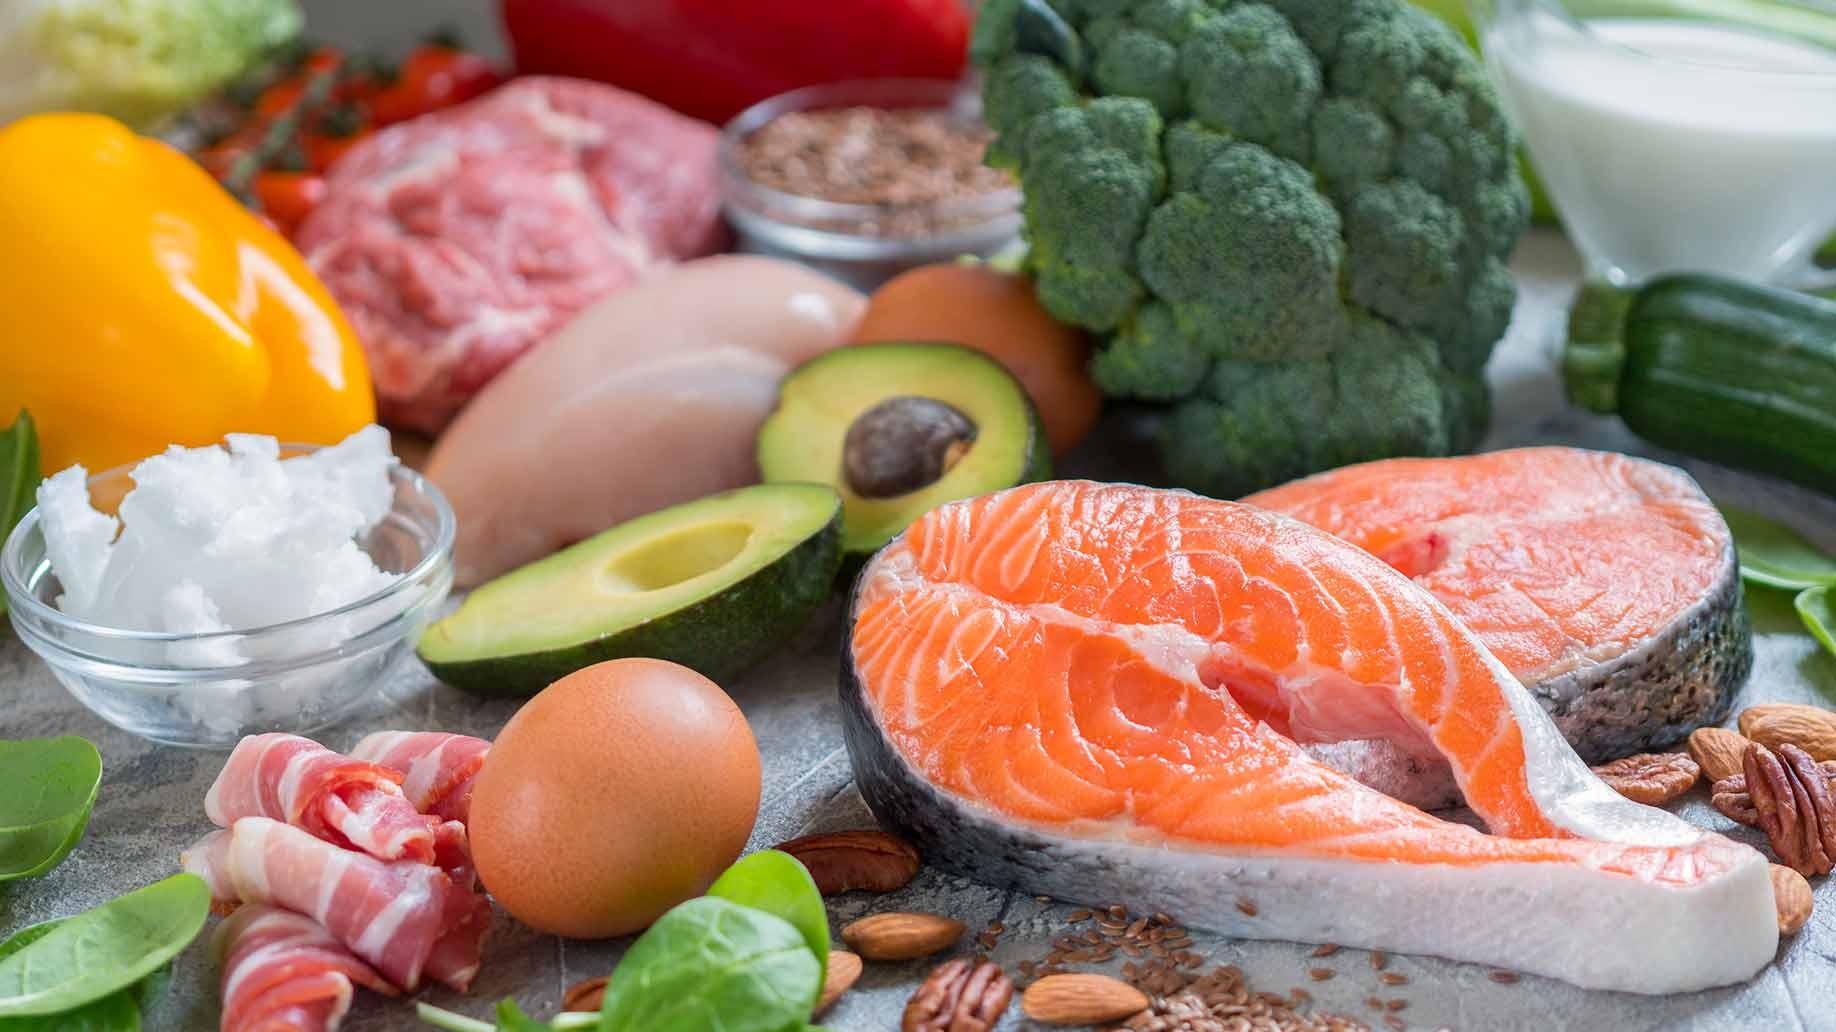 ketogenic diet fish oil egg nuts avocado green leafy diabetes prediabetes natural remedies